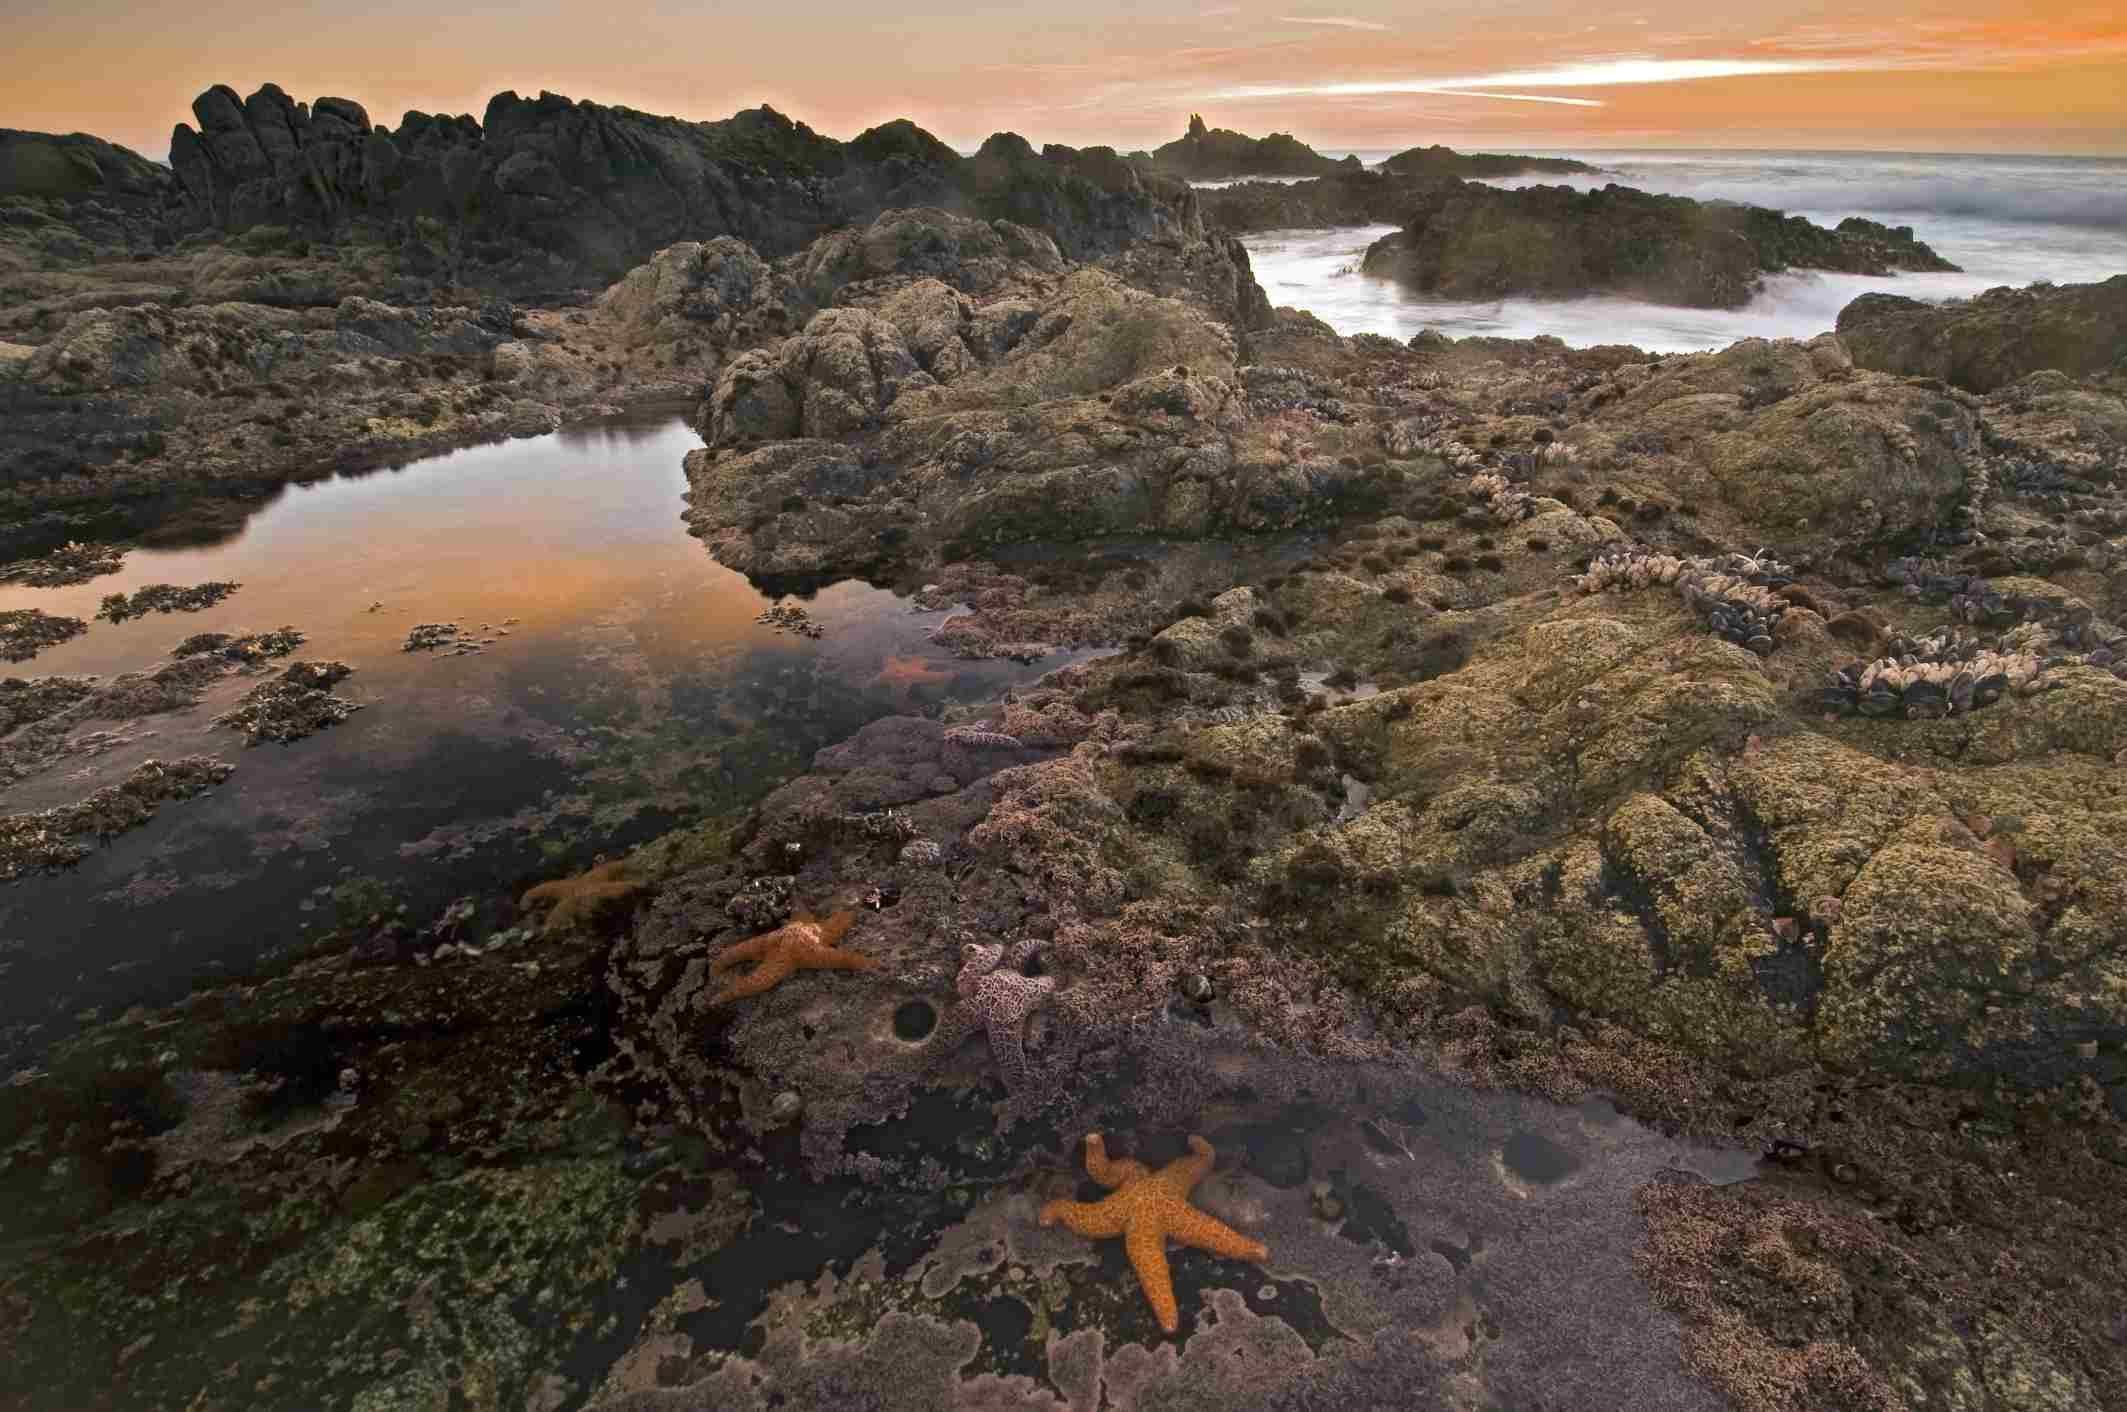 Sea stars in a tide pool on a rocky beach under an orange sunset sky.